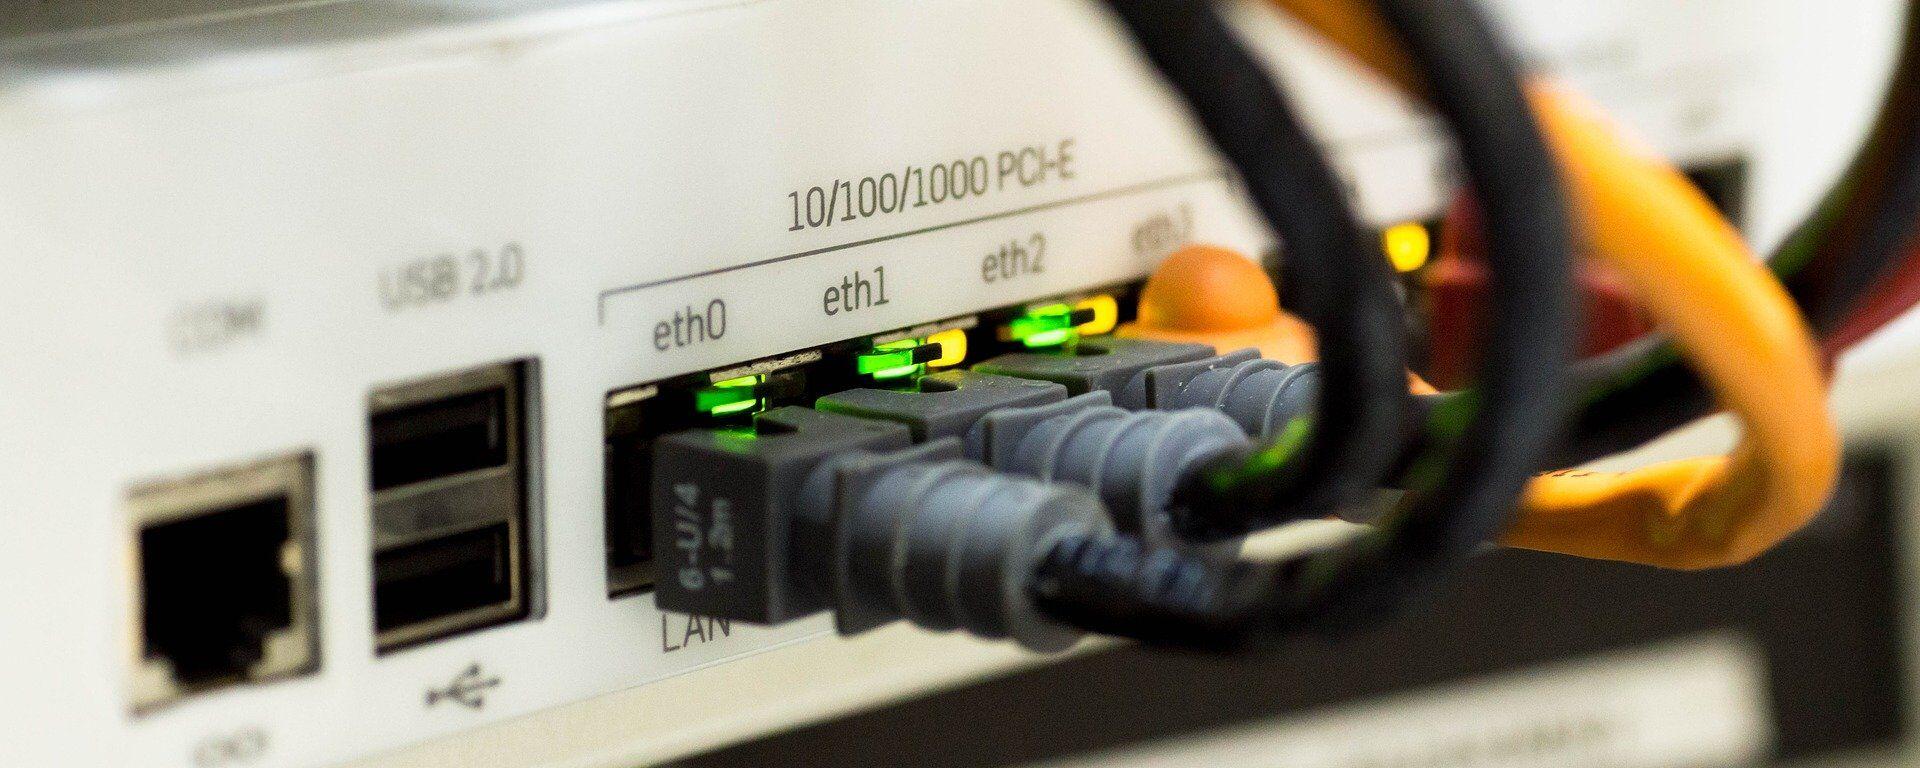 Cables de internet (imagen ilustrativa)  - Sputnik Mundo, 1920, 29.05.2019